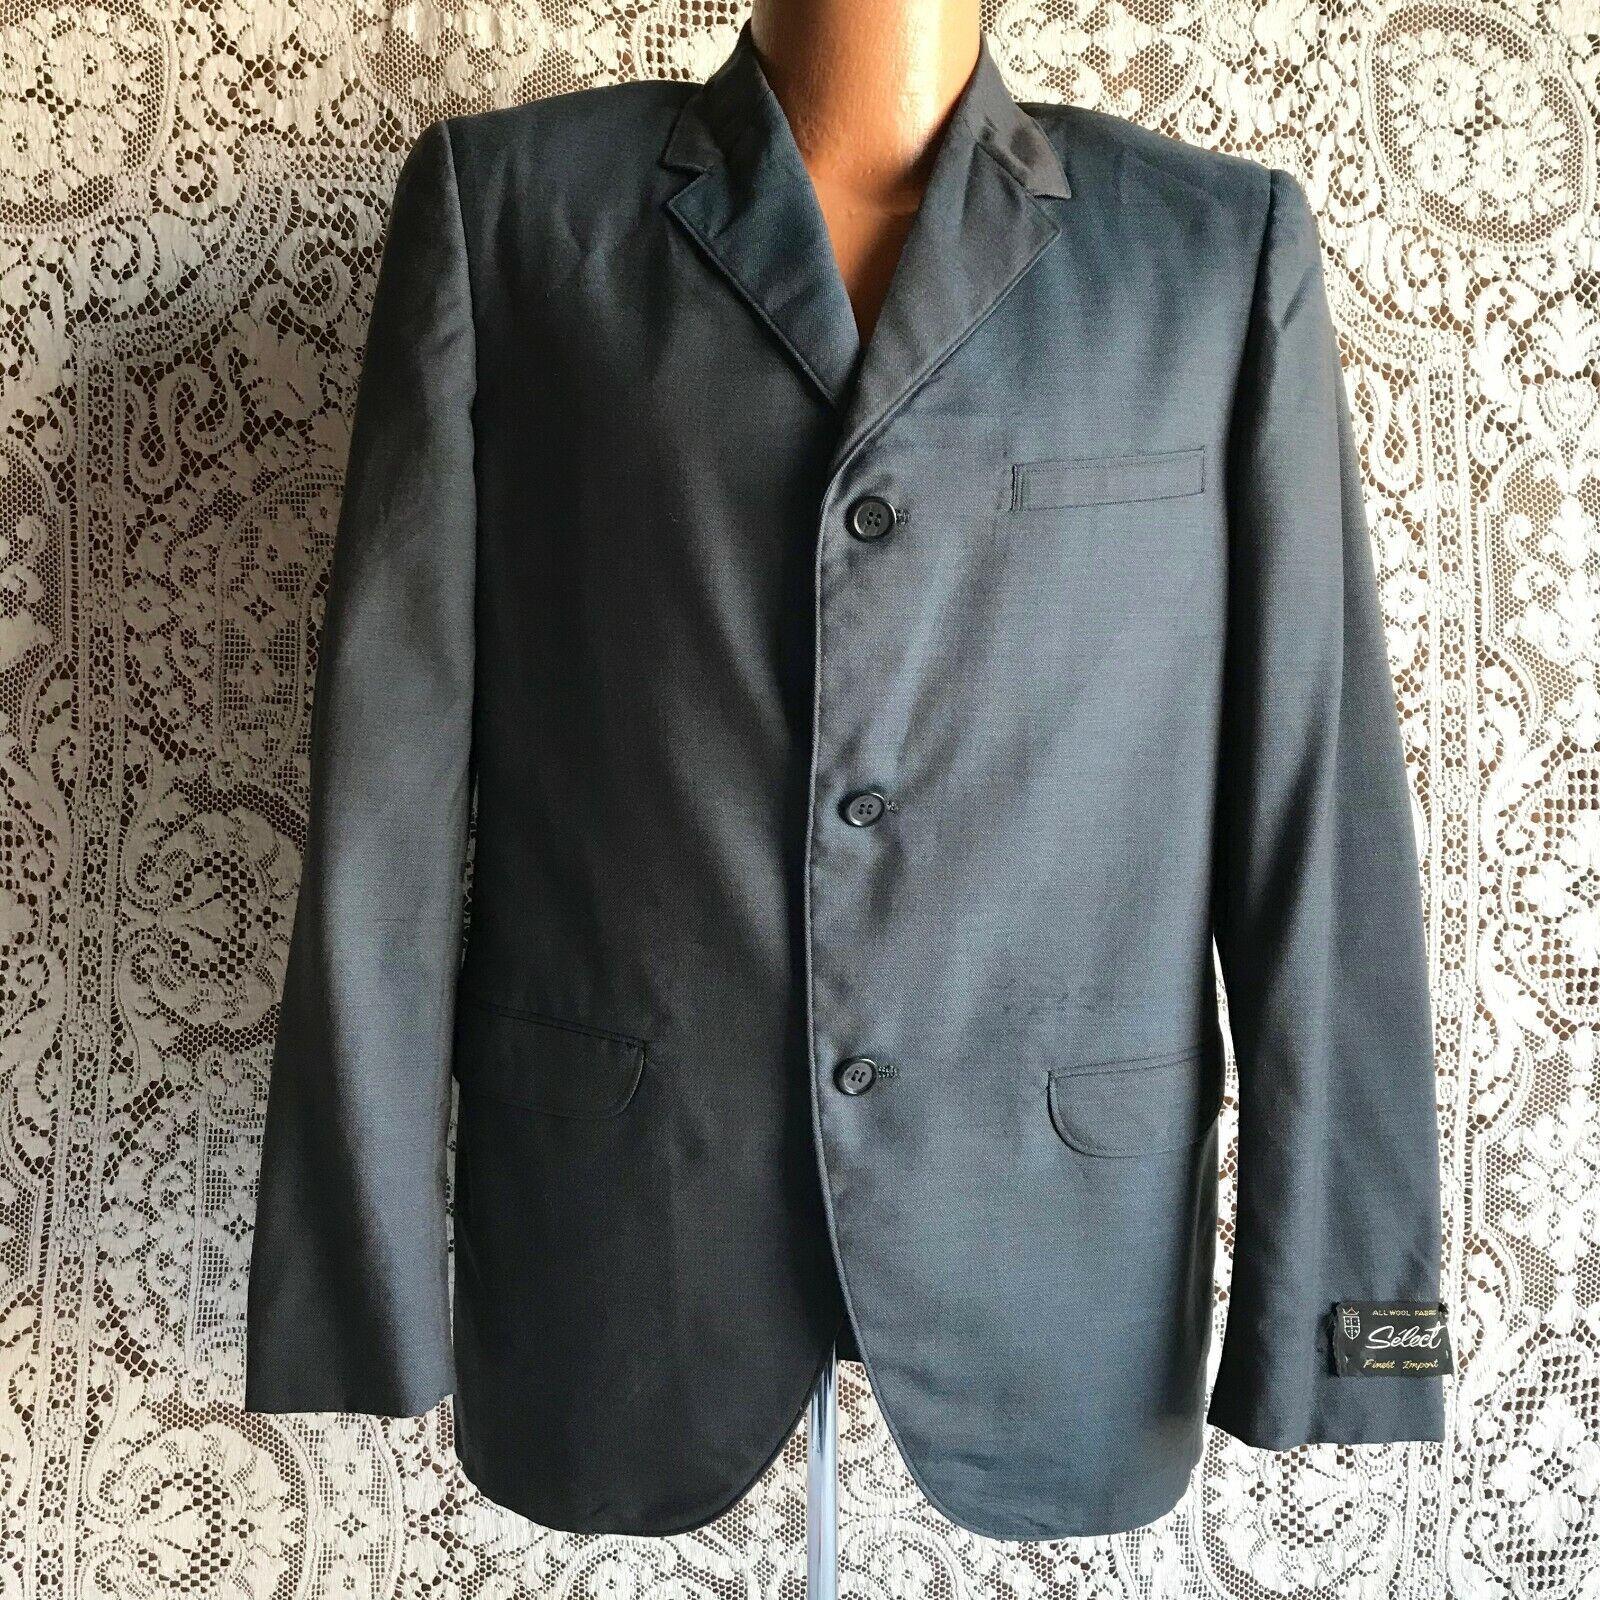 Metal Back Zipper Light Gray Knit Collar 1950s1960s Dark Gray Short Sleeve Blouse